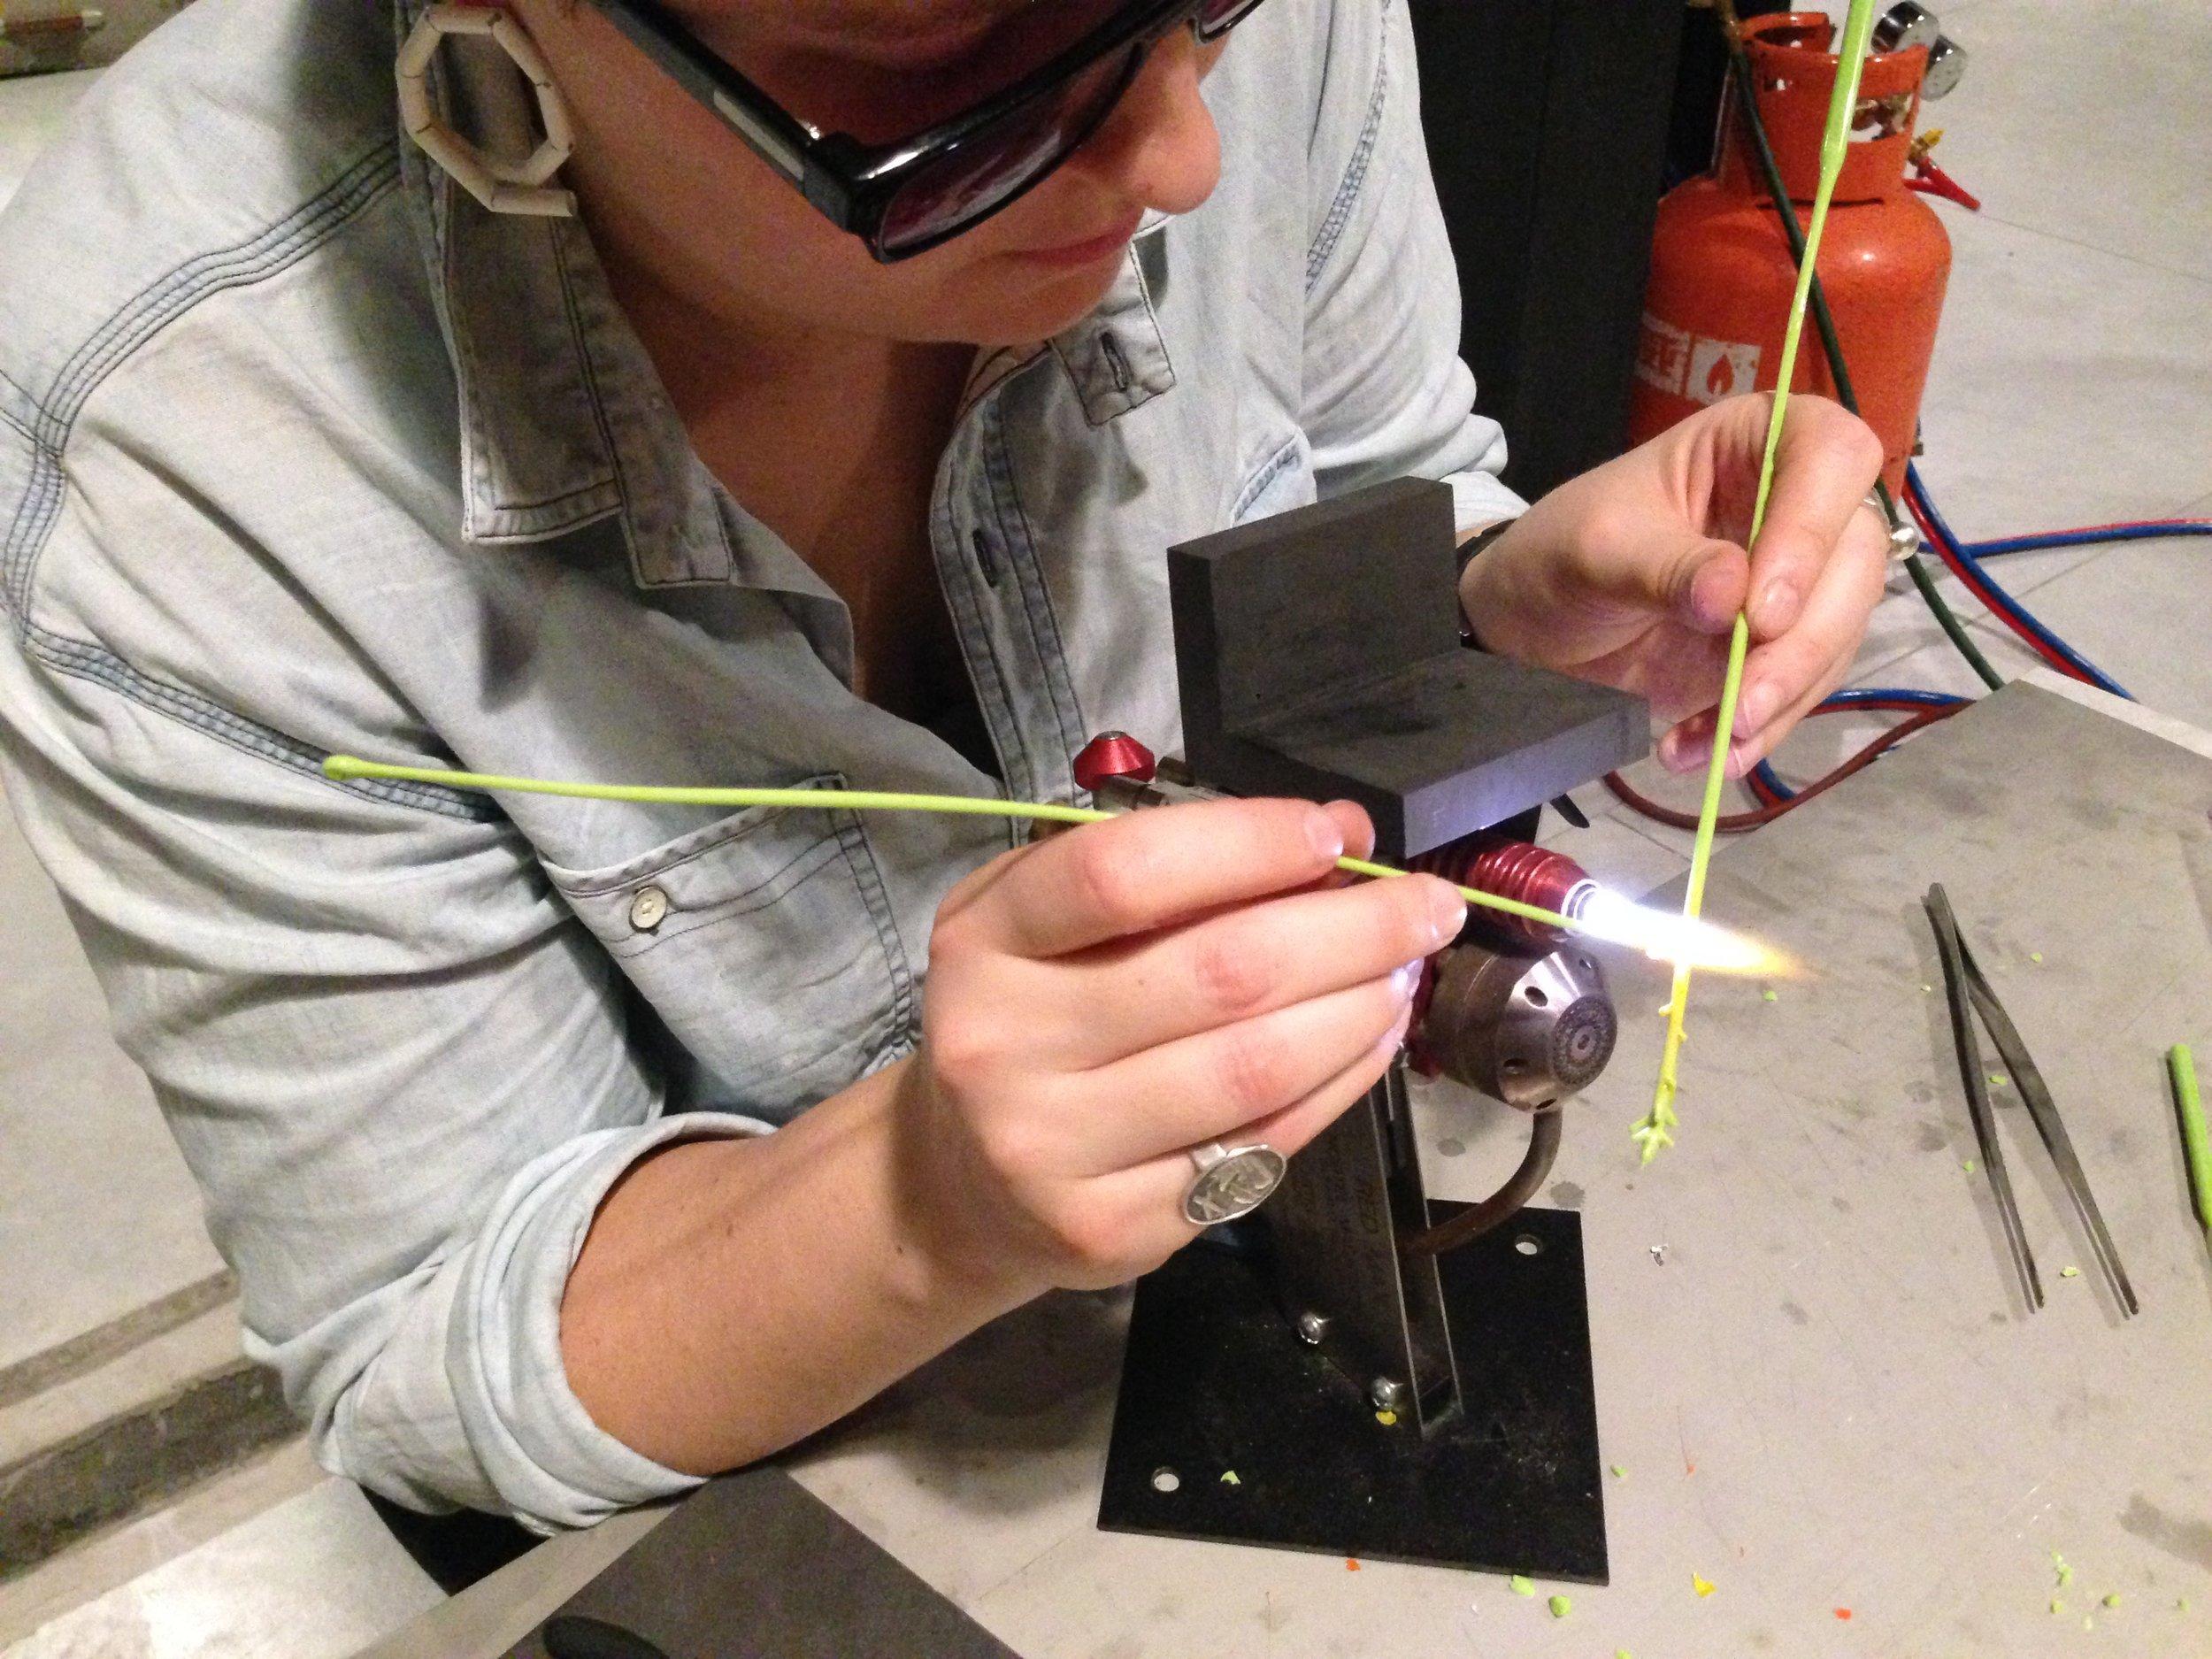 Jess Dare making small glass components